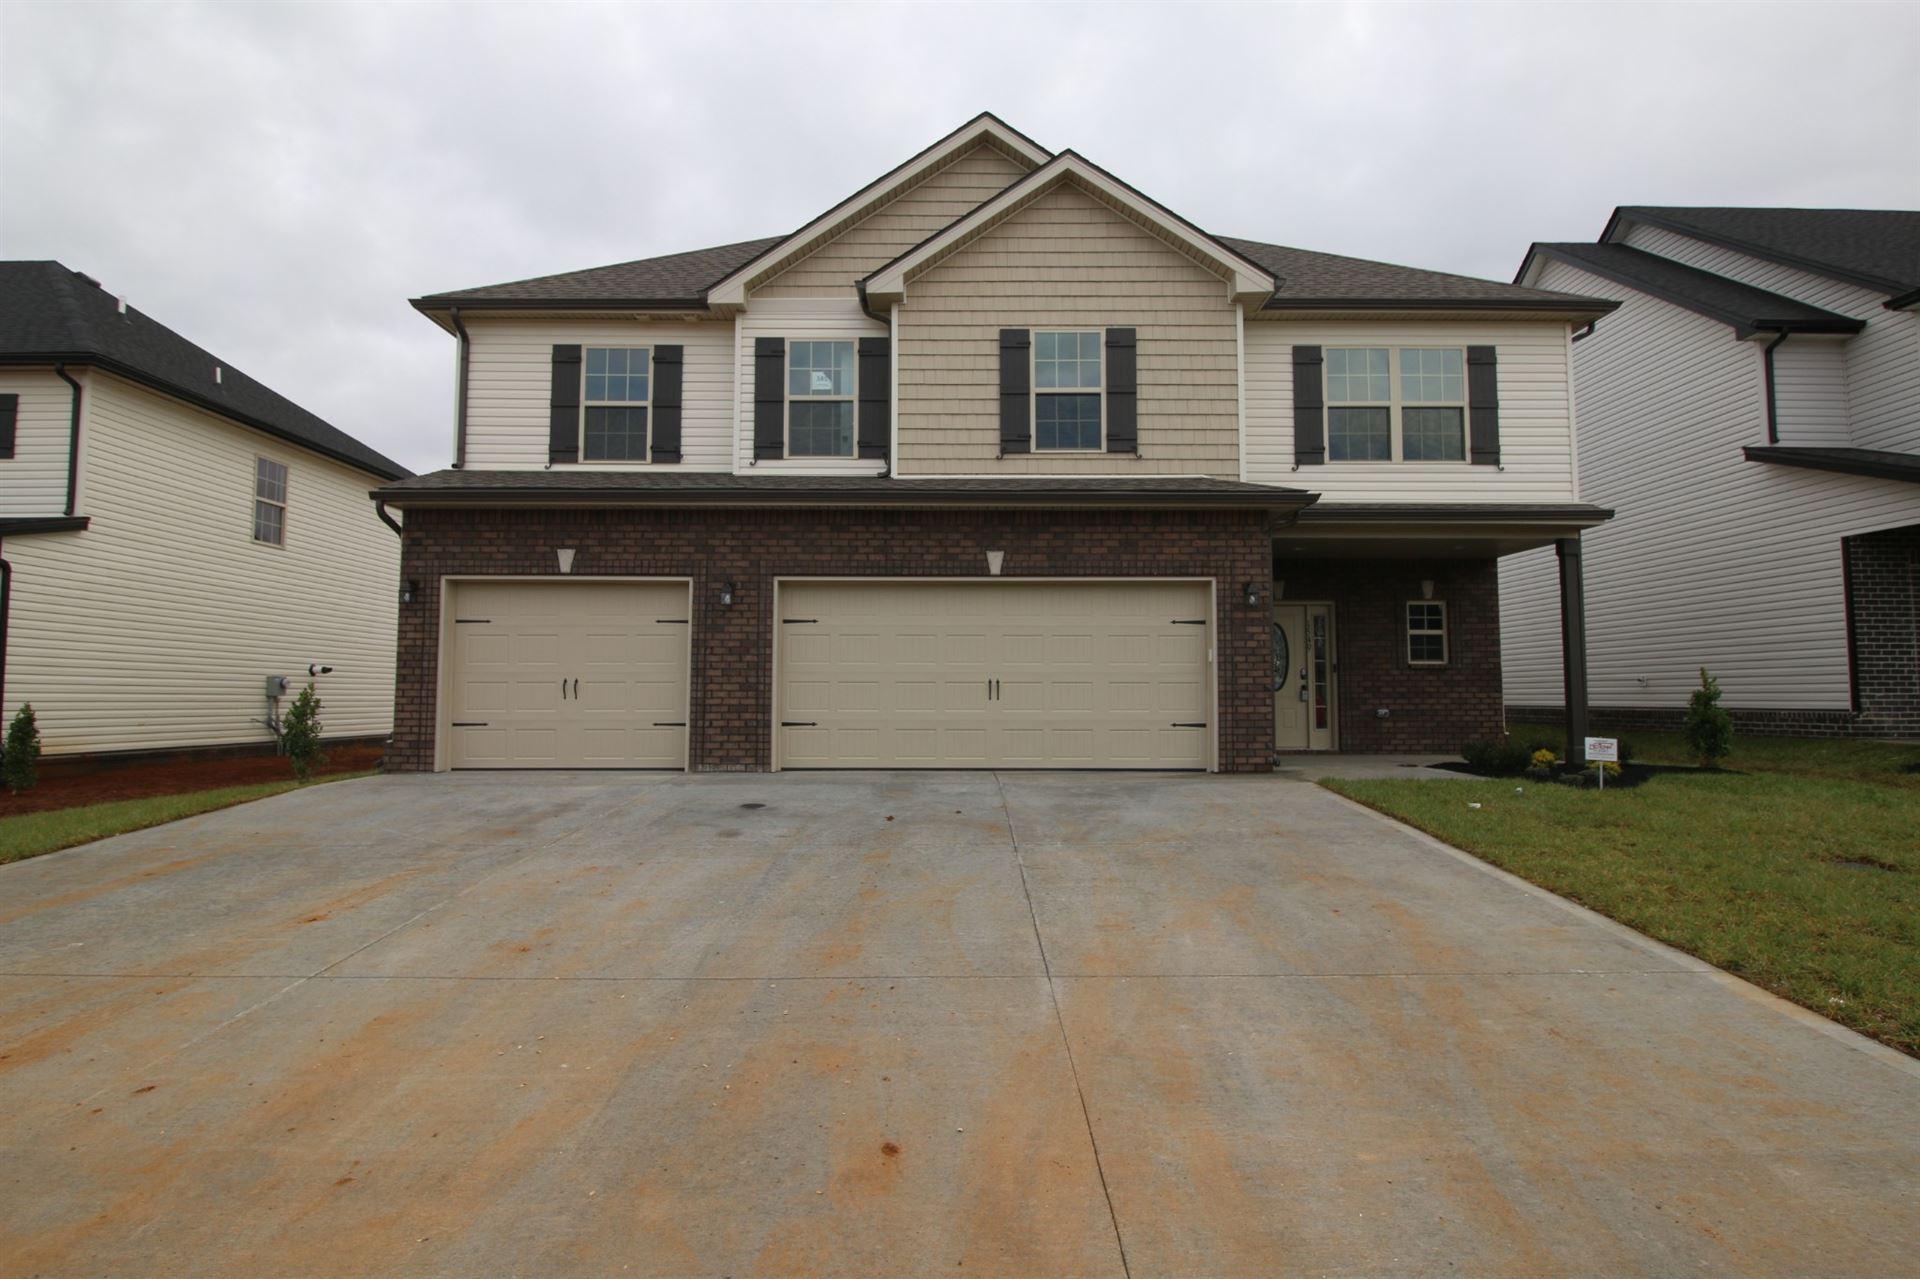 385 Summerfield, Clarksville, TN 37040 - MLS#: 2289931